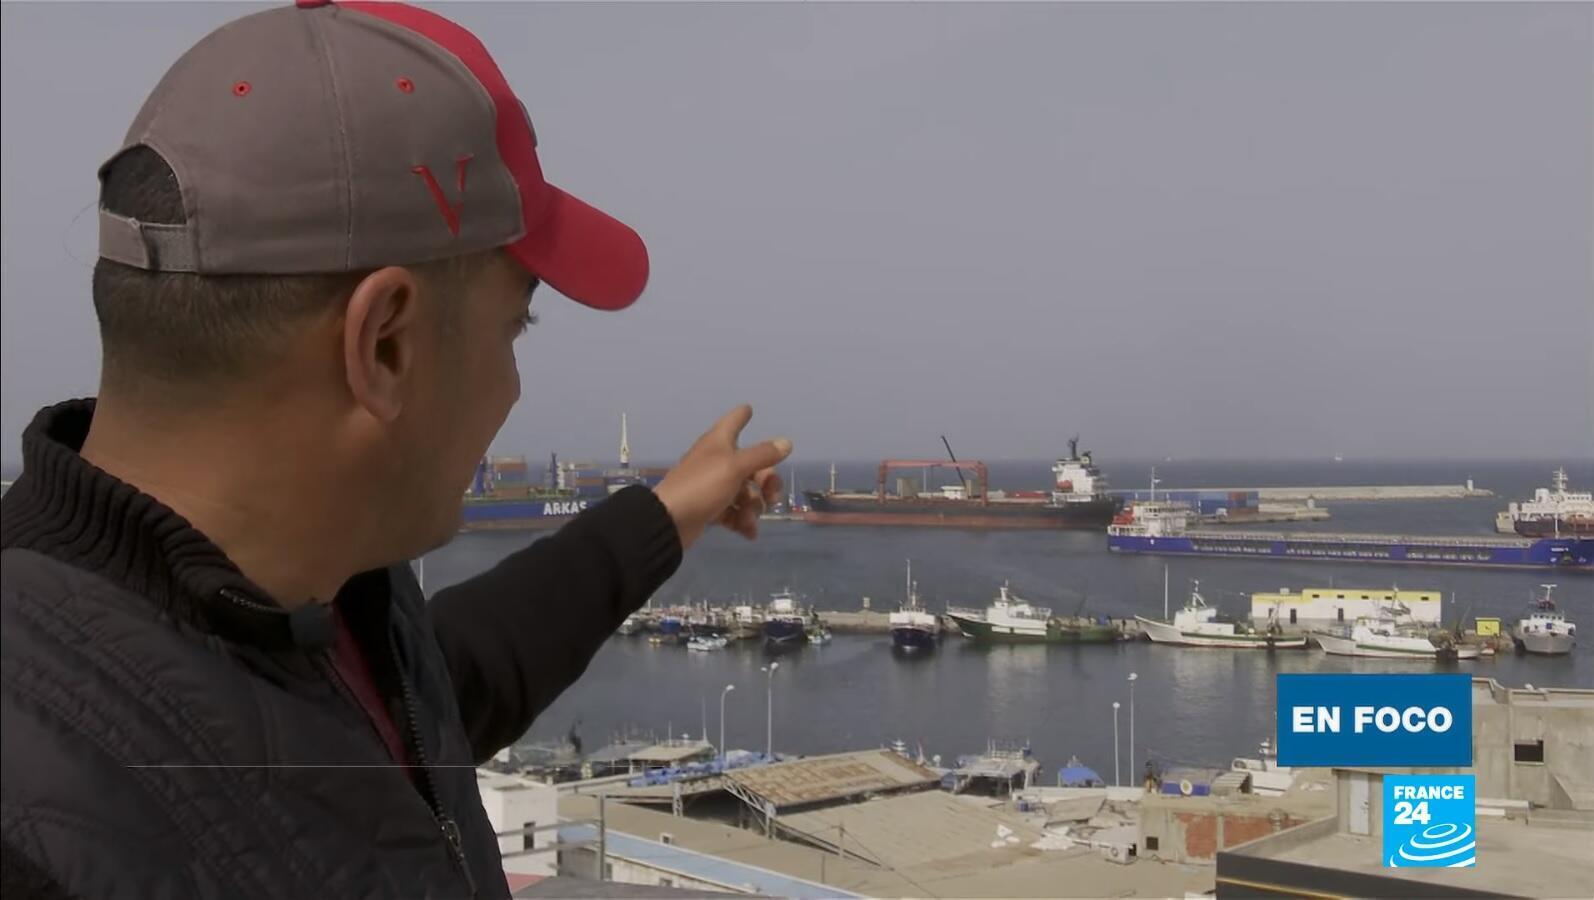 en foco - basuras Tunez